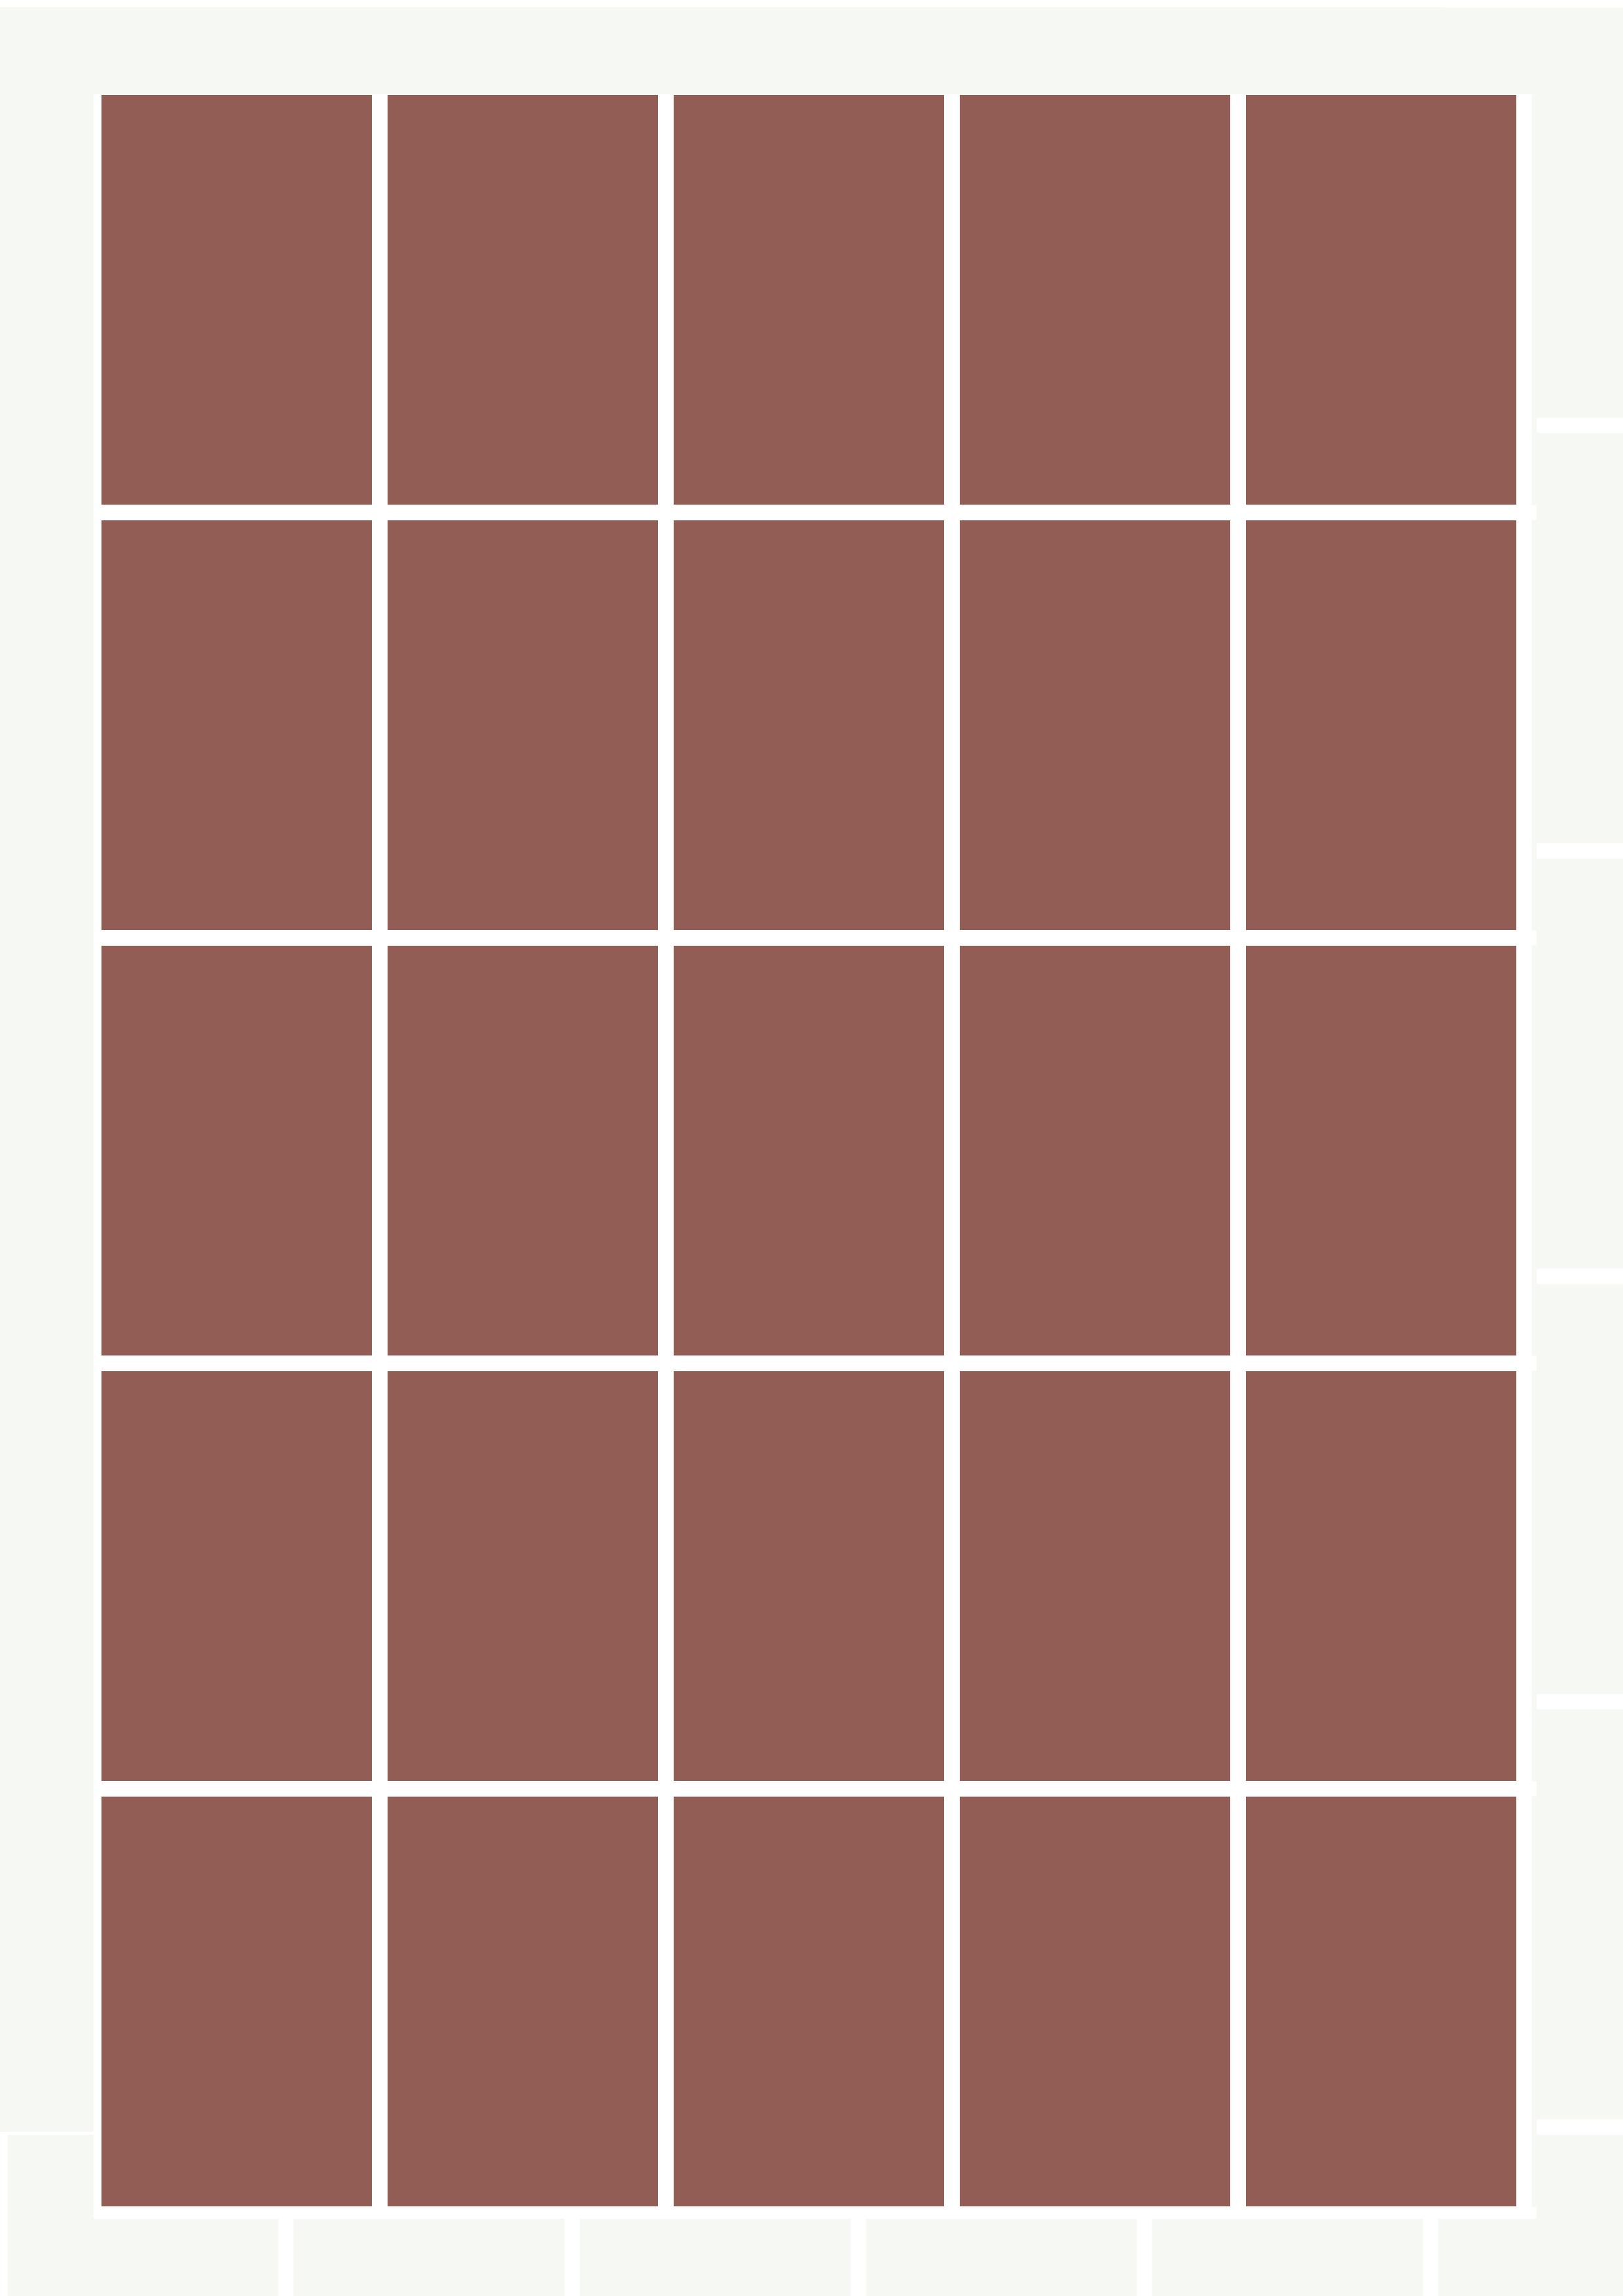 a4纸尺寸是多少 a4图纸标题栏尺寸 a4尺寸word背景素材